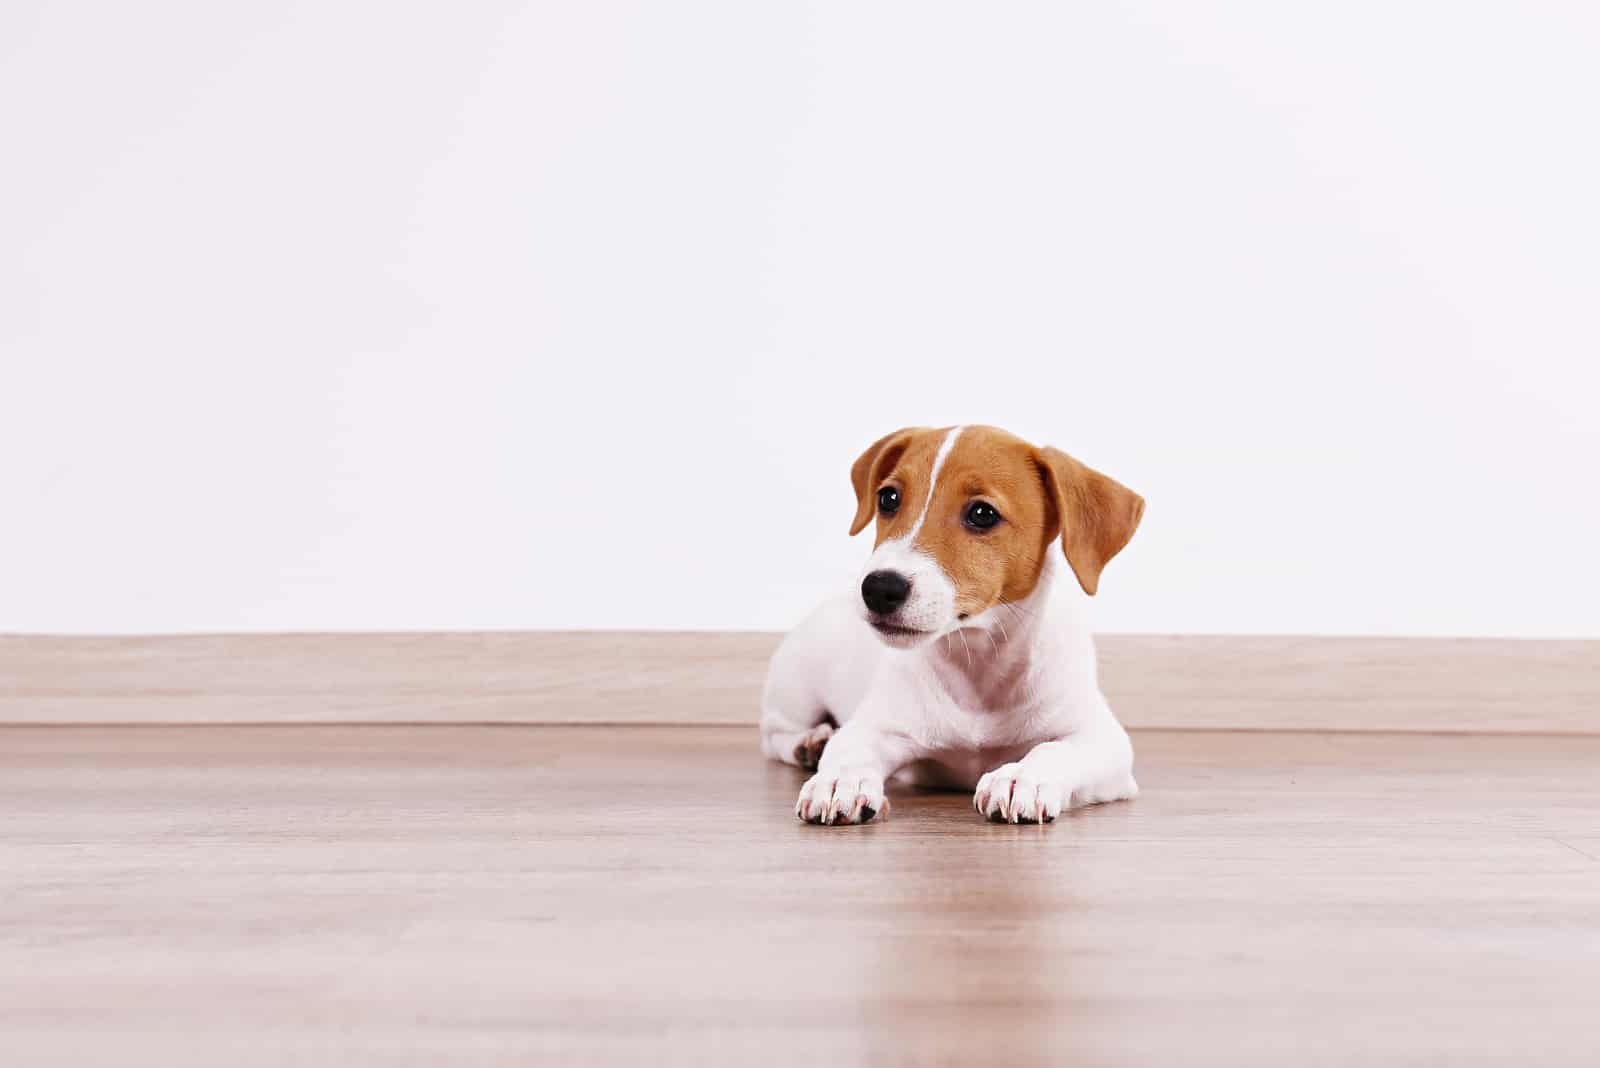 Jack Russel Terrier Welpe mit gefalteten Ohren